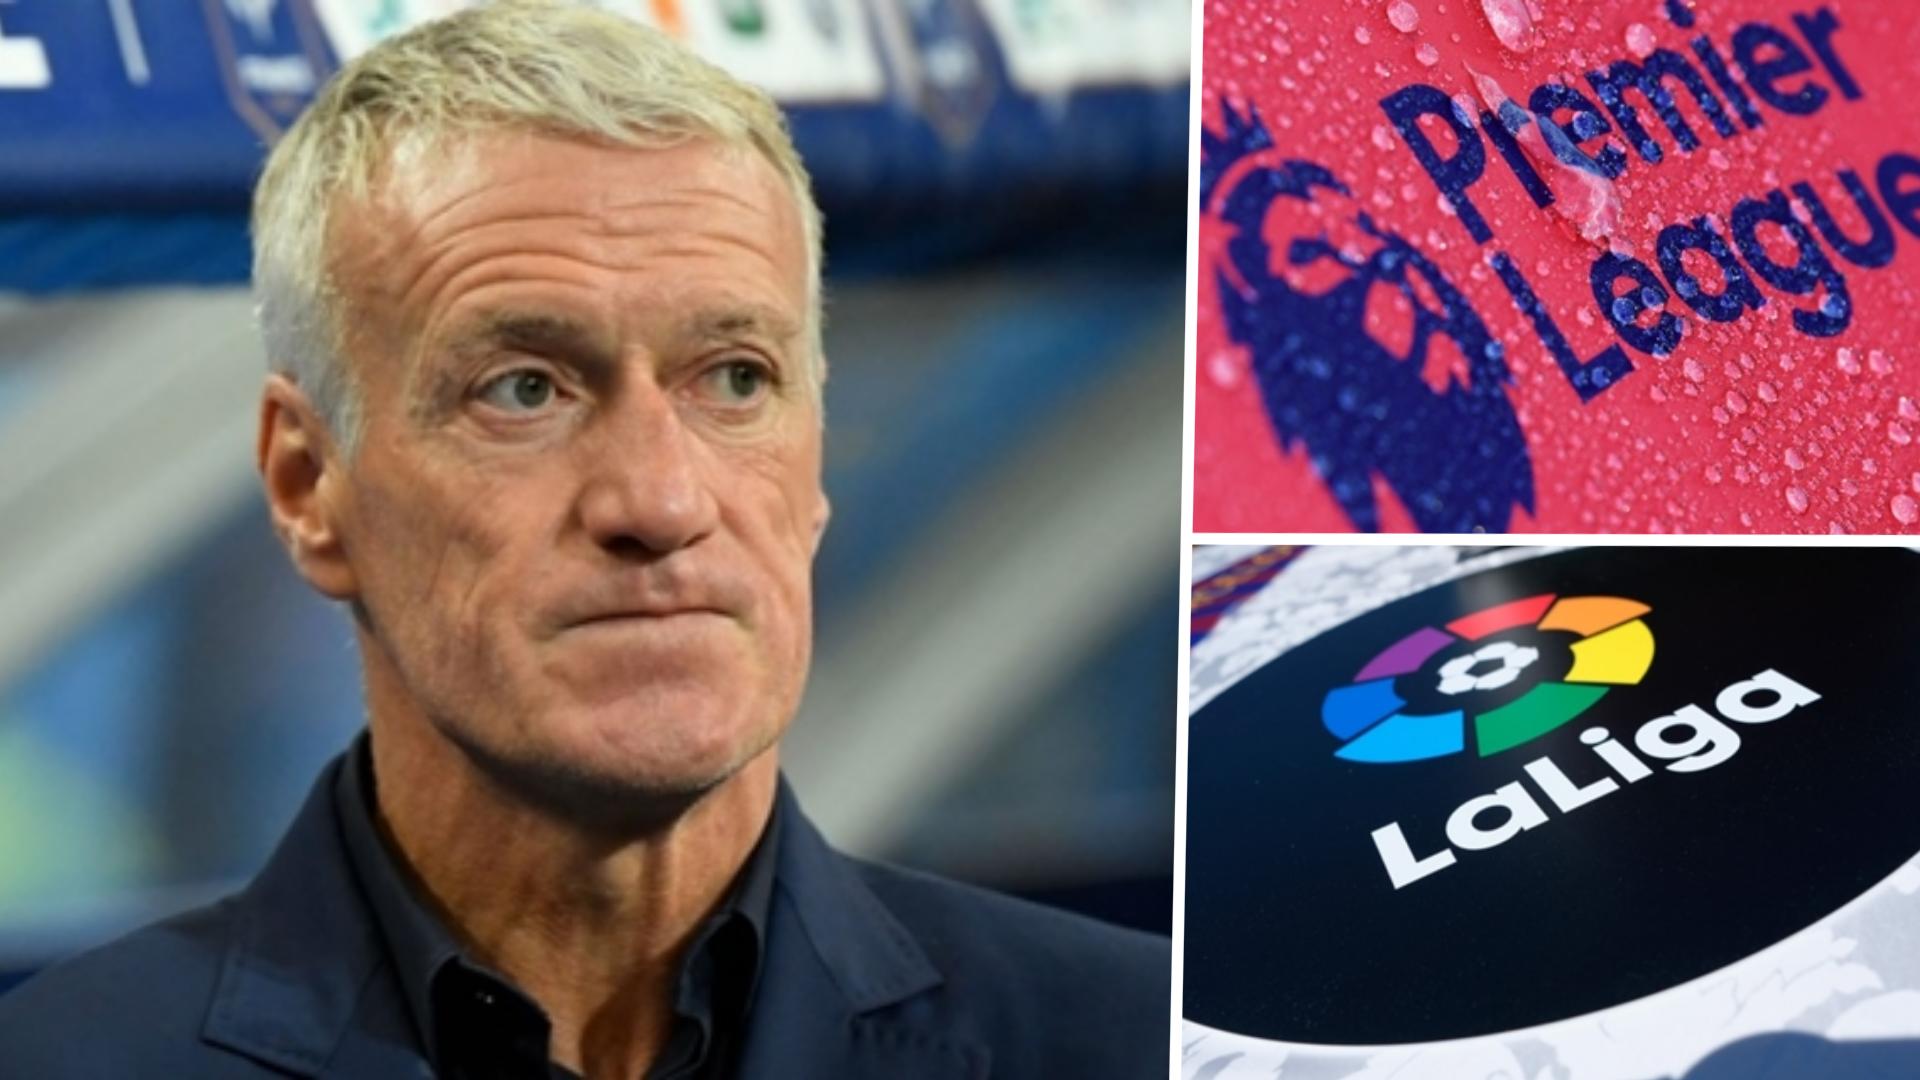 'Premier League & La Liga prioritising money' - Deschamps concerned over league restarts after coronavirus